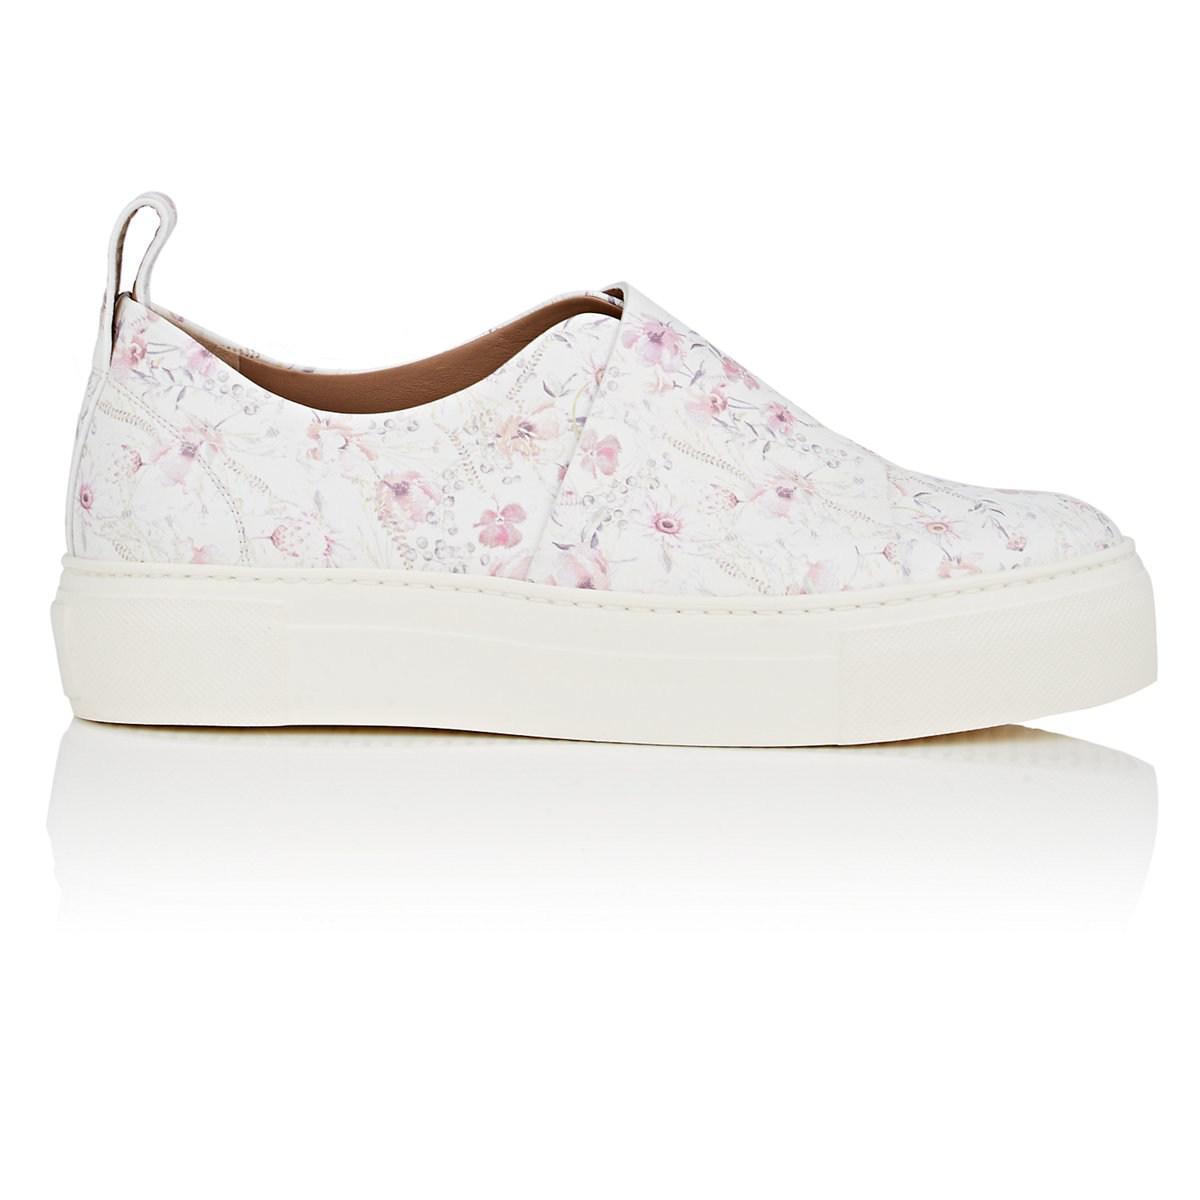 Womens Ariel Leather Platform Sneakers Calvin Klein z4cpzpf